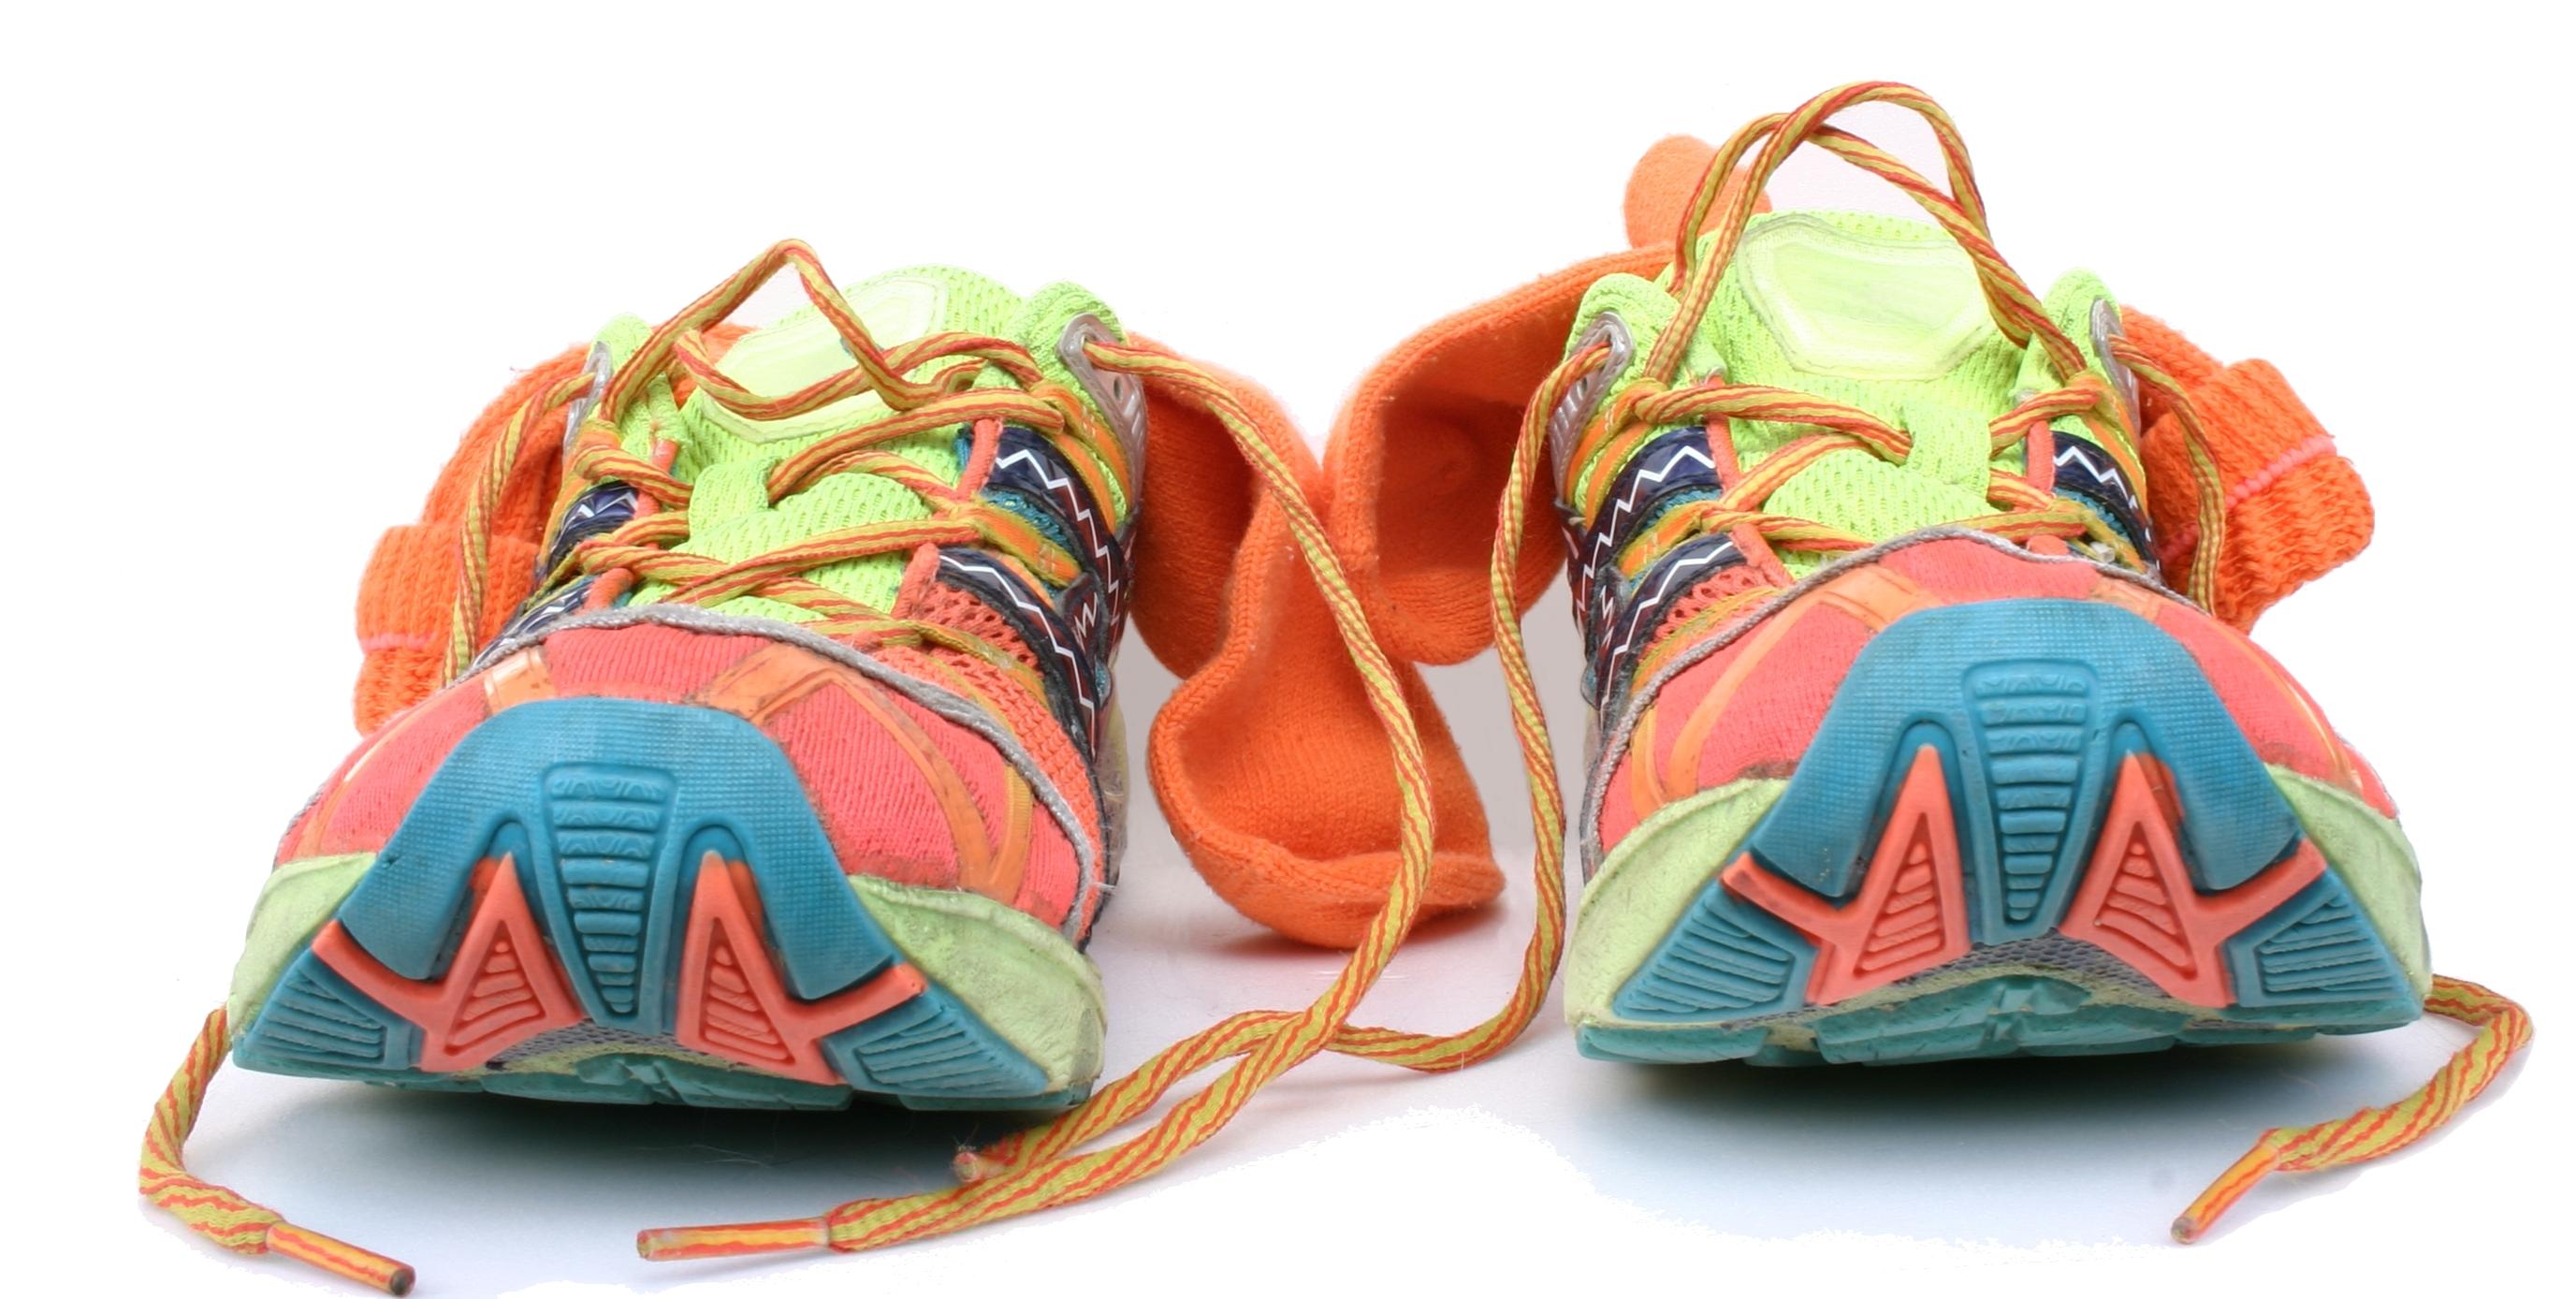 Asics Jogging Shoes Review